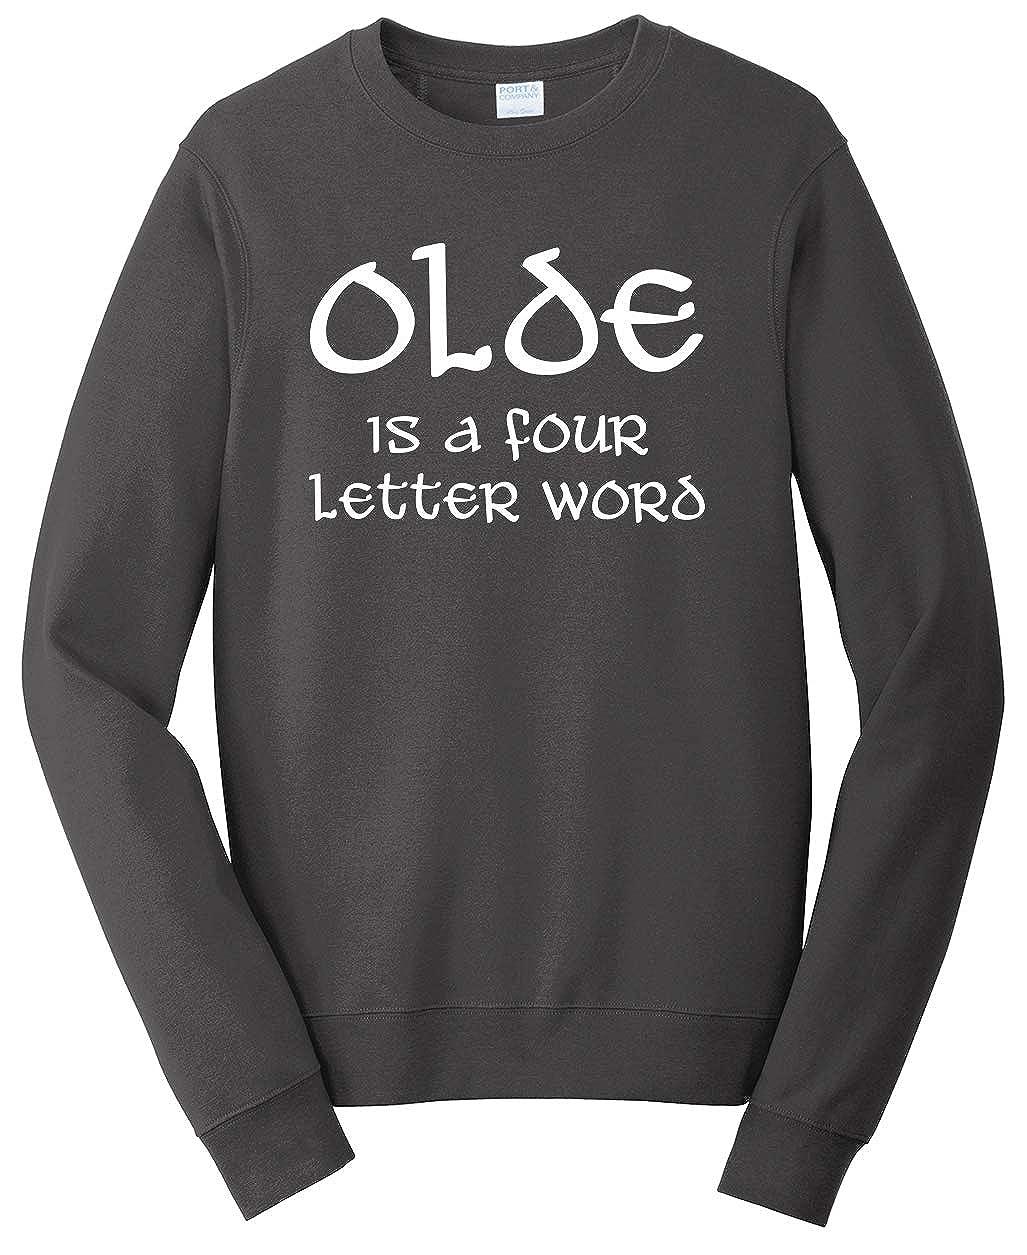 Tenacitee Unisex Olde is a Four Letter Word Sweatshirt